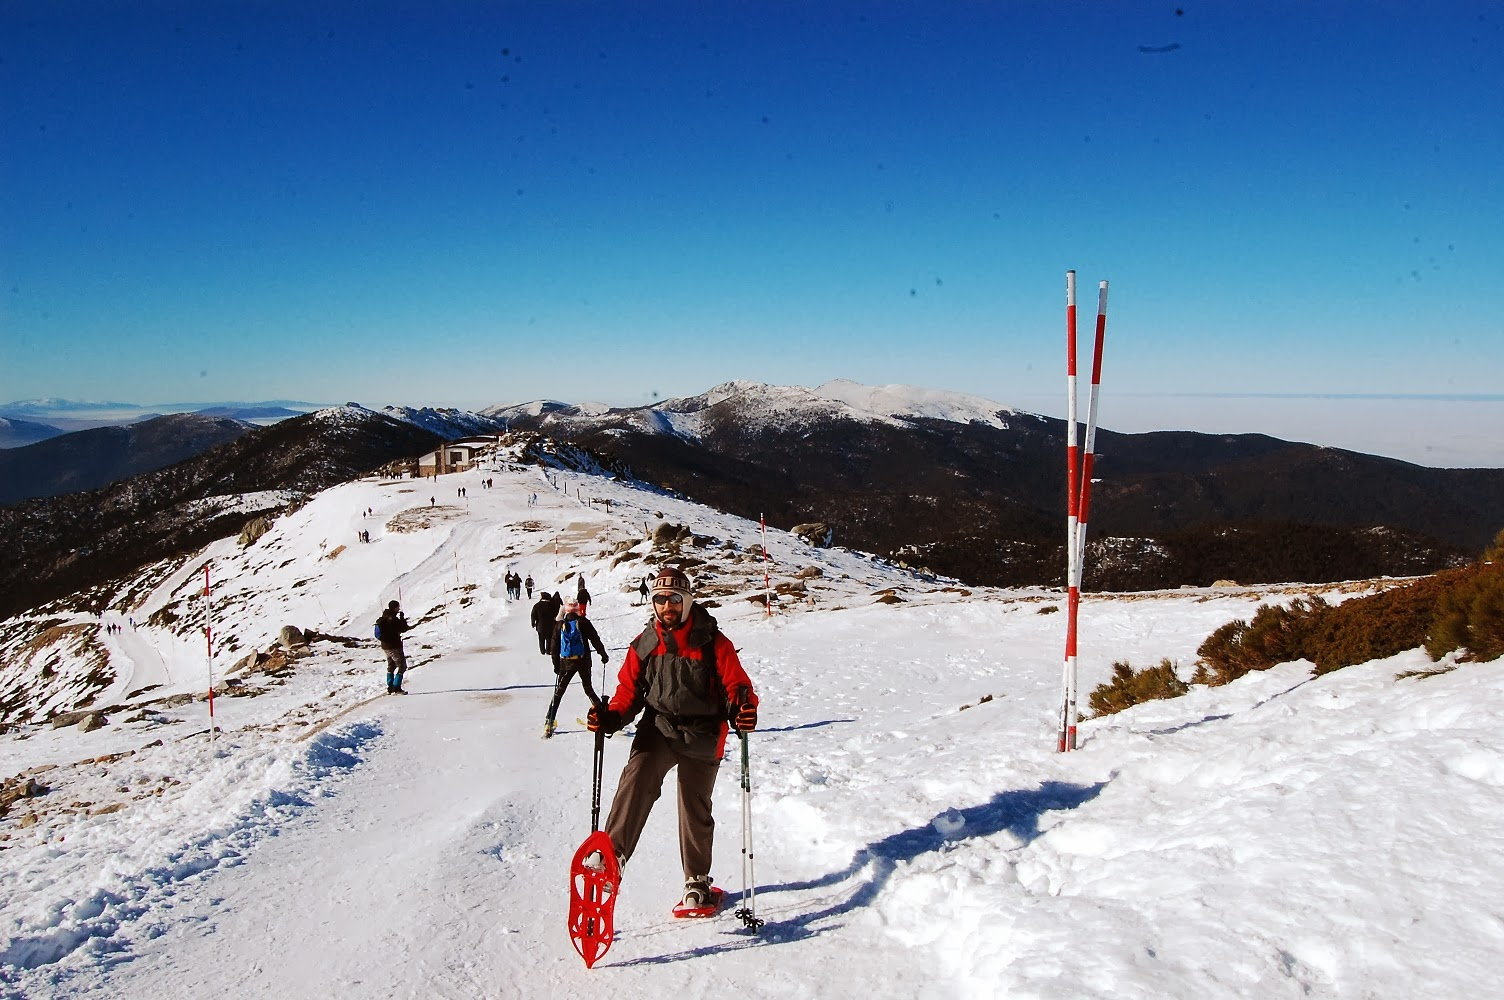 Blog Go Tandem - Subida a Bola con raquetas de nieve